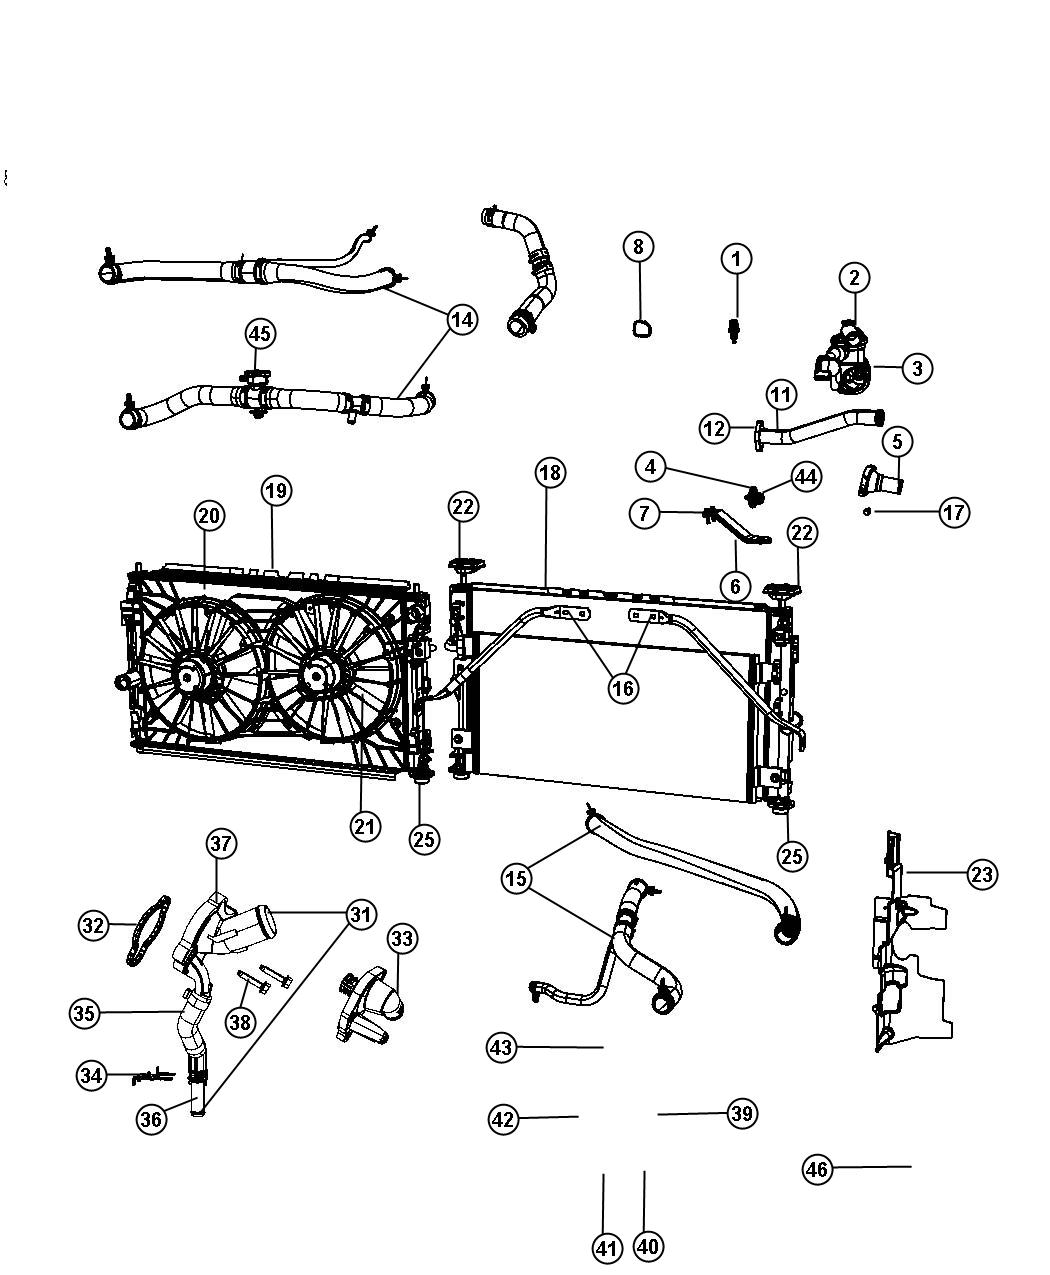 2007 chrysler sebring wiring diagram da3000 door access parts